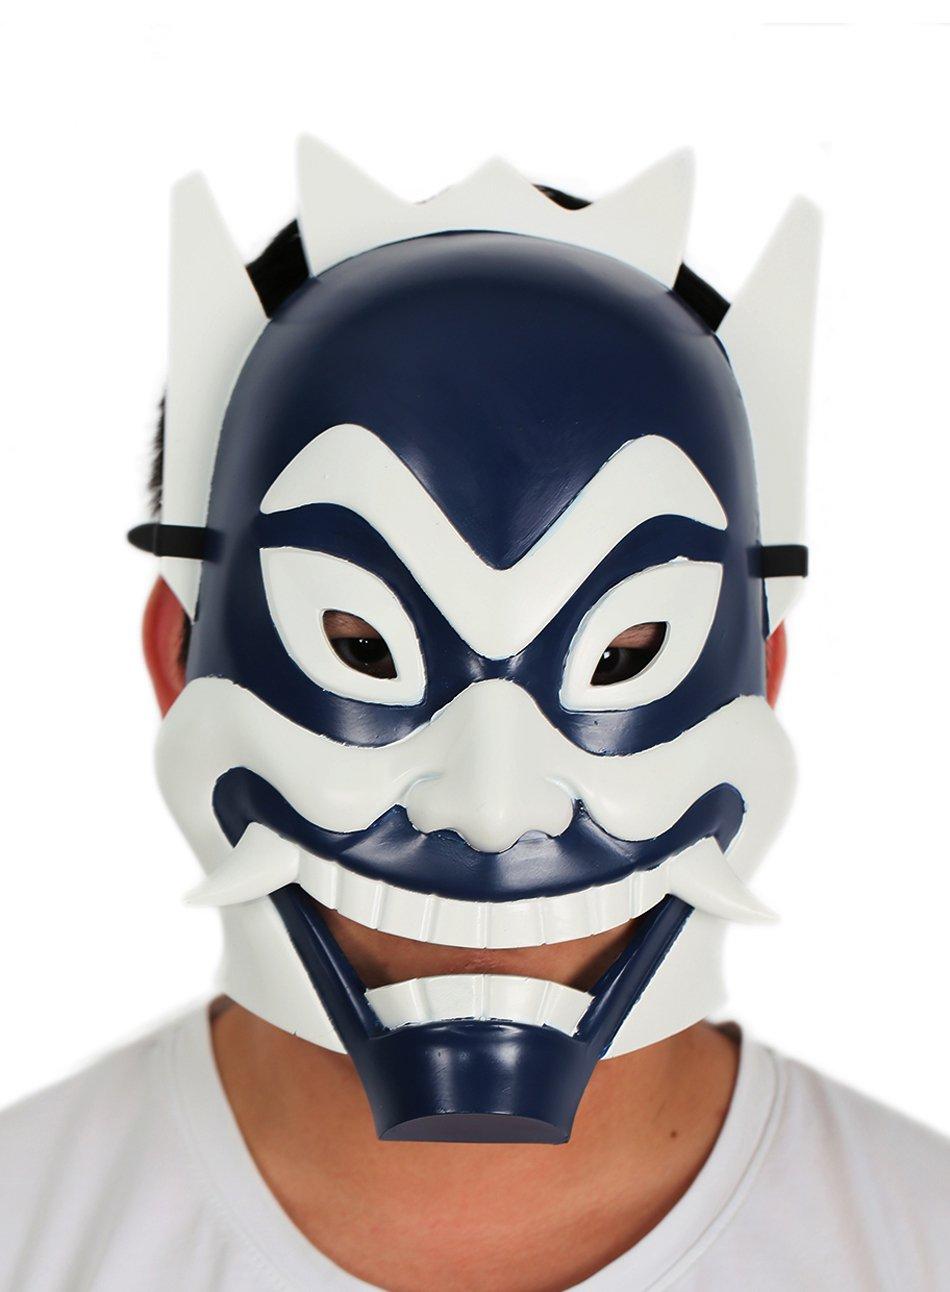 xcoser Zukos Blue Spirit Mask Deluxe Adult Cosplay Blue White Mask